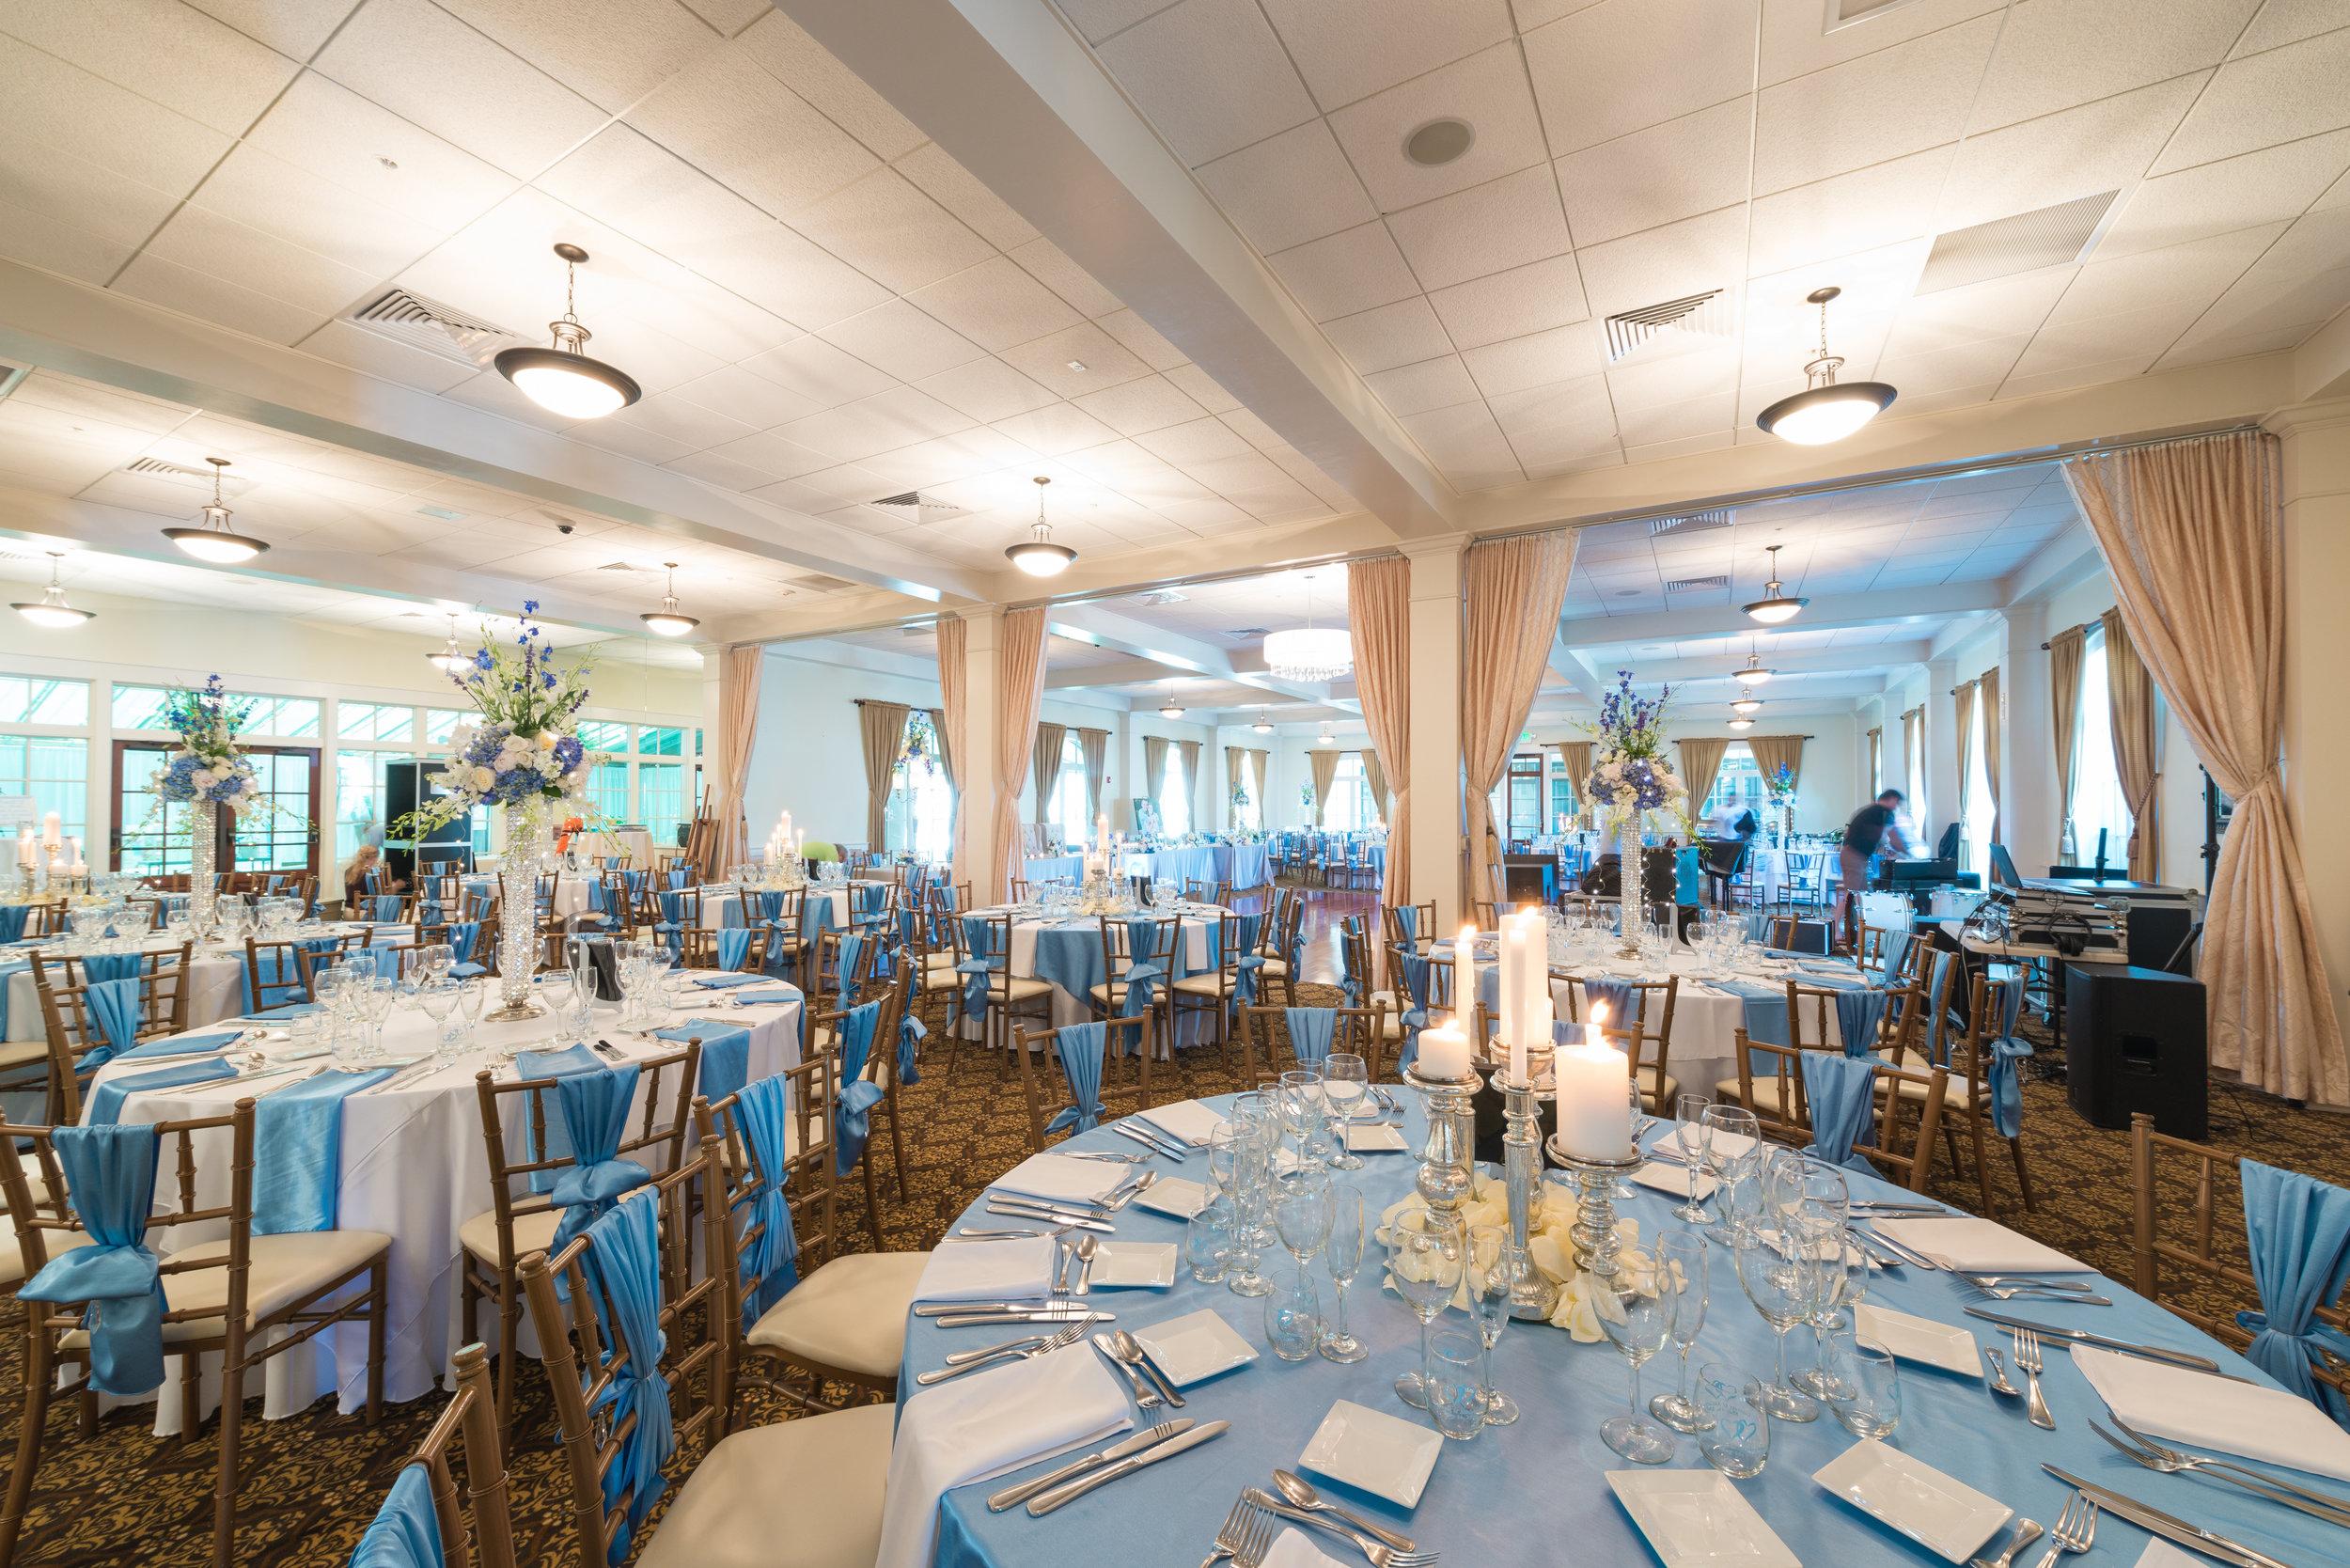 Carl-Kerridge-Photography-North-Beach-Wedding-May-2015-012.jpg